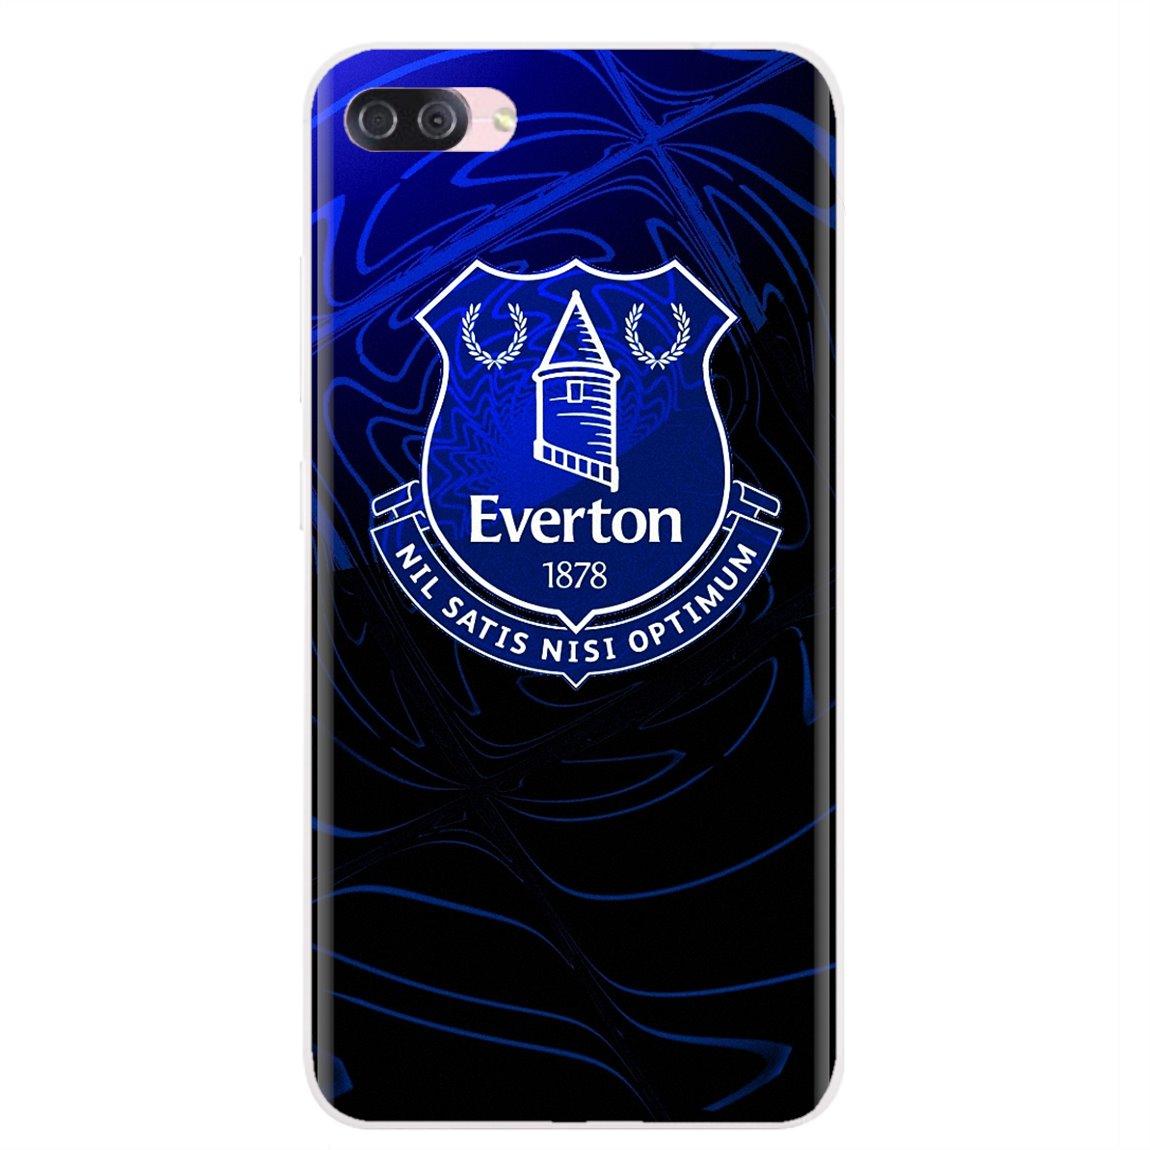 Силиконовый чехол для телефона, чехол для Xiaomi mi a1 A2 A3 5X6X8 9t Lite SE Pro mi Max mi x 1 2 3 2S Everton football Soccer FC Team Logo